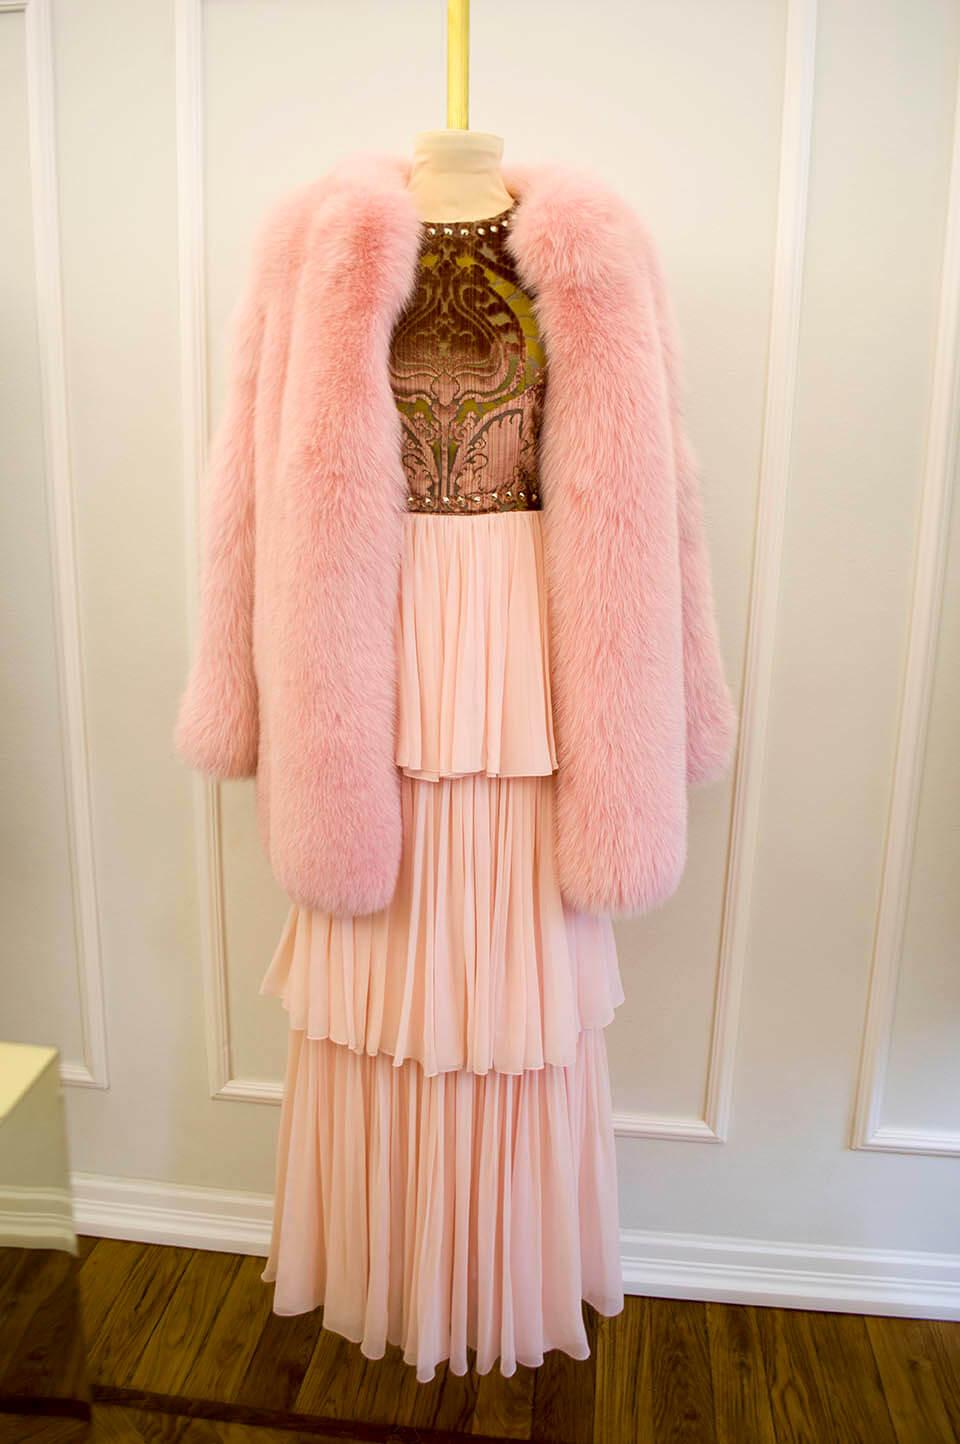 Vladimiro Gioia - pink fur